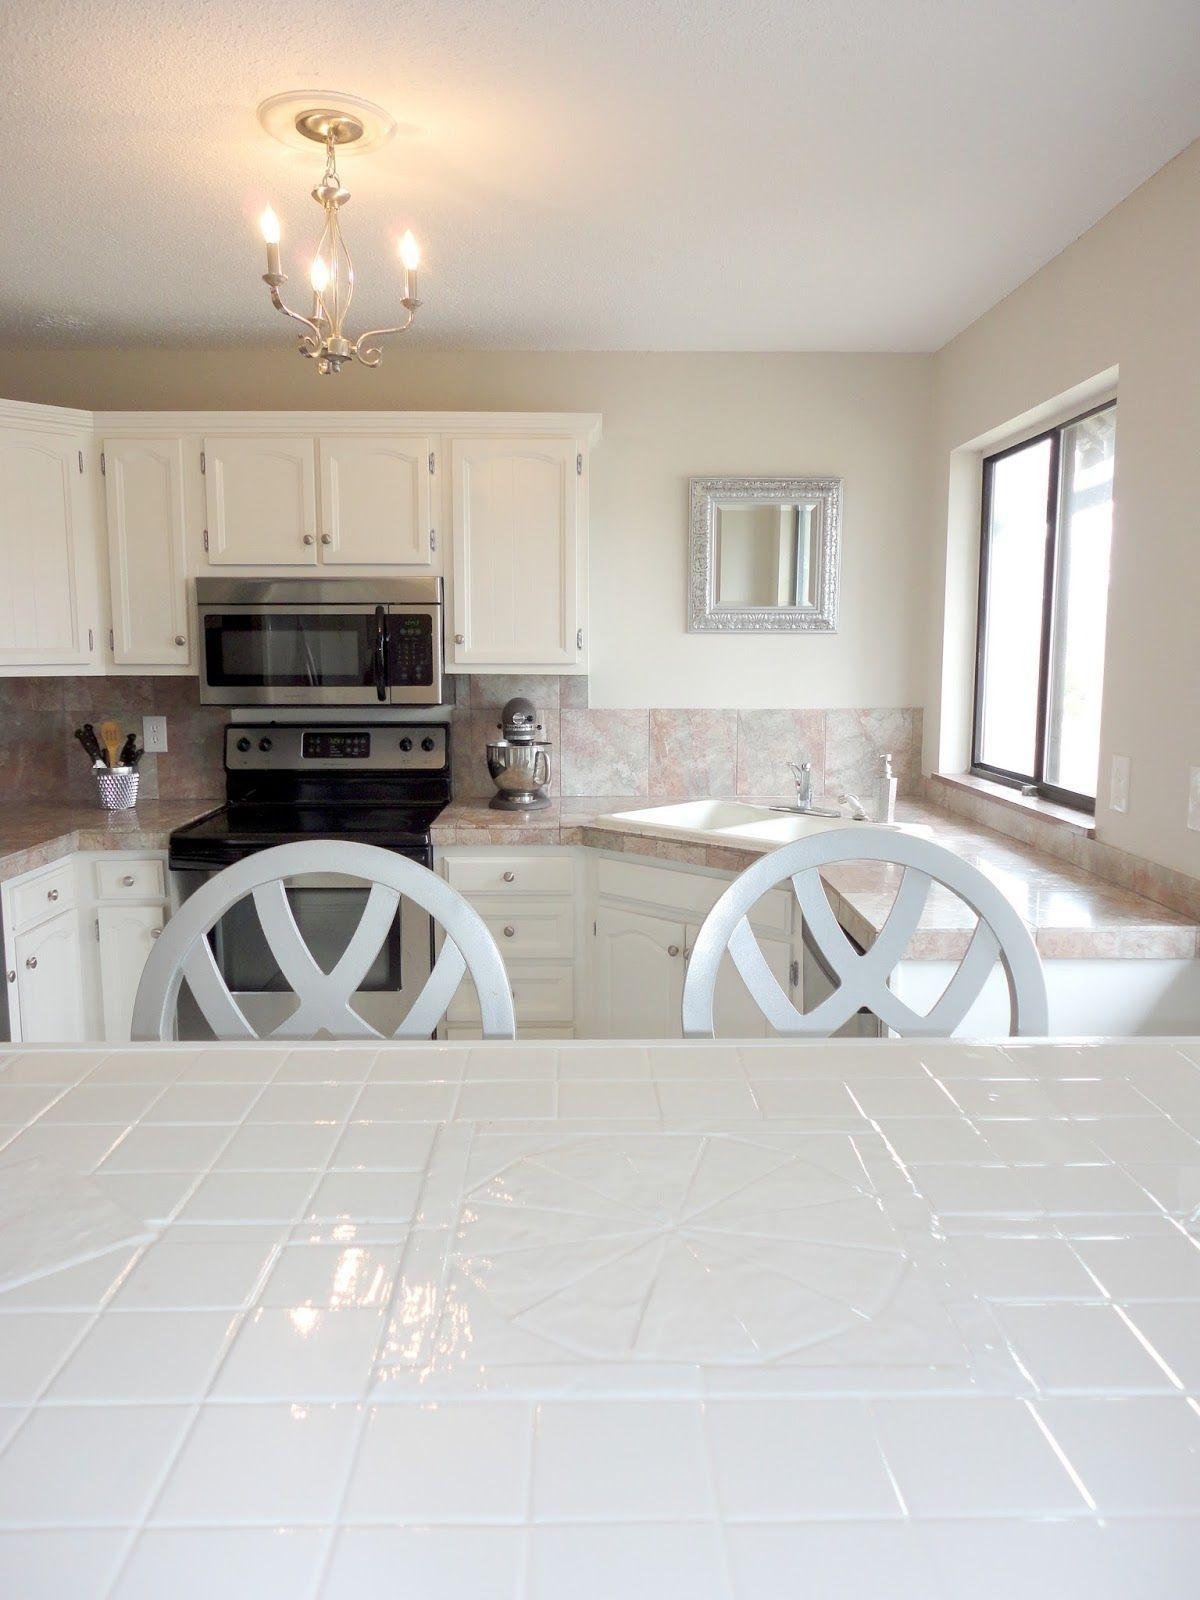 Admiring Granite Kitchen Countertops Ideas That You Shouldnt Miss18